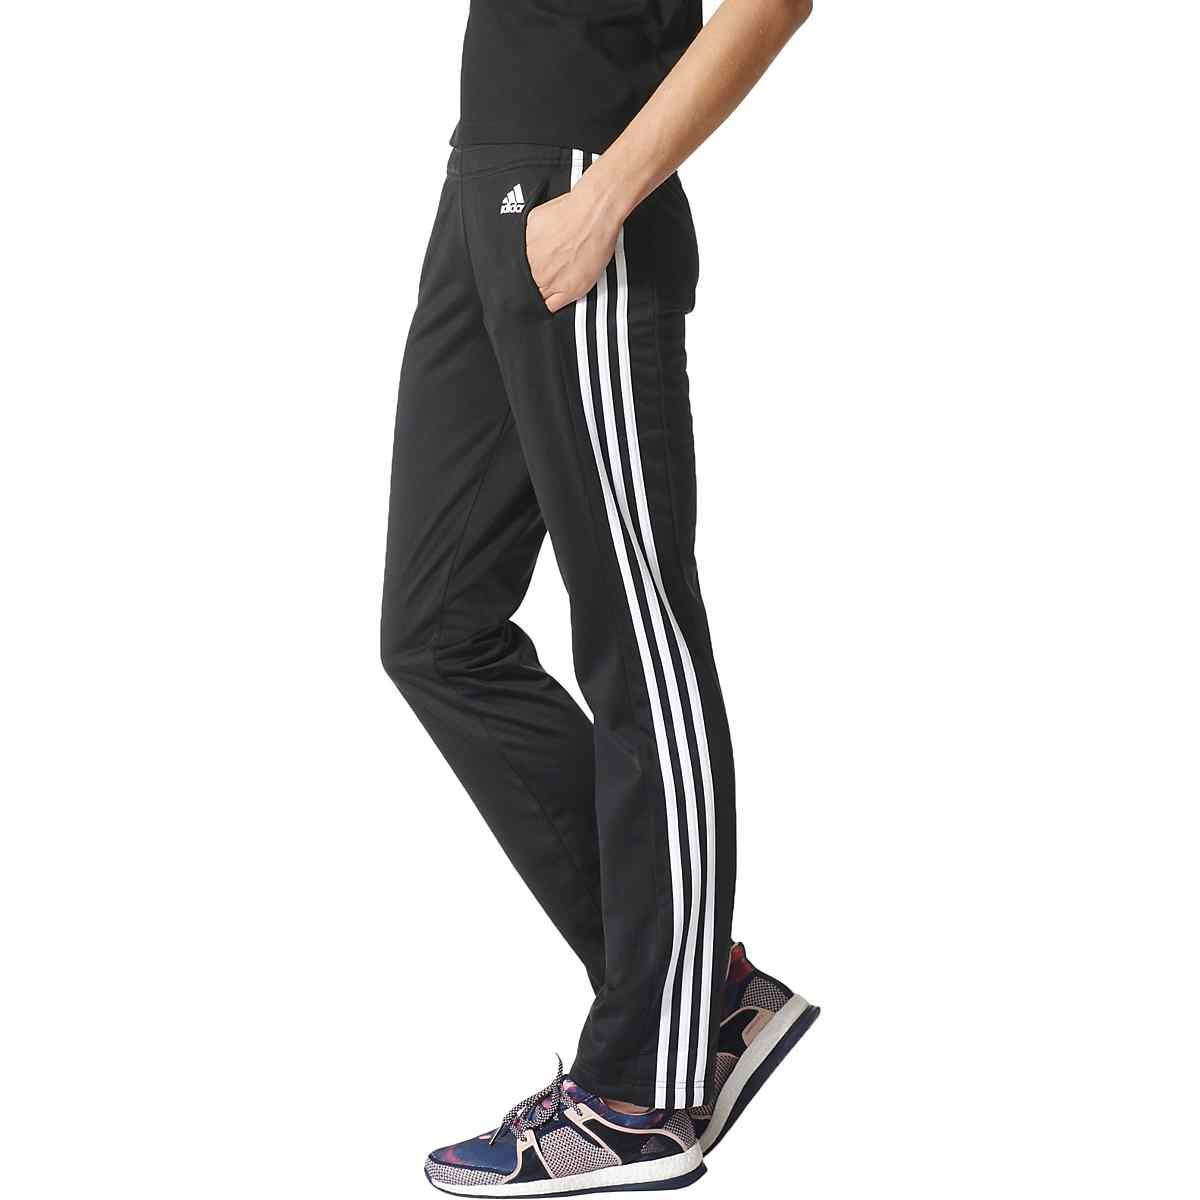 adidas Designed-2-Move Straight Pant - Women's XS/A Black/White